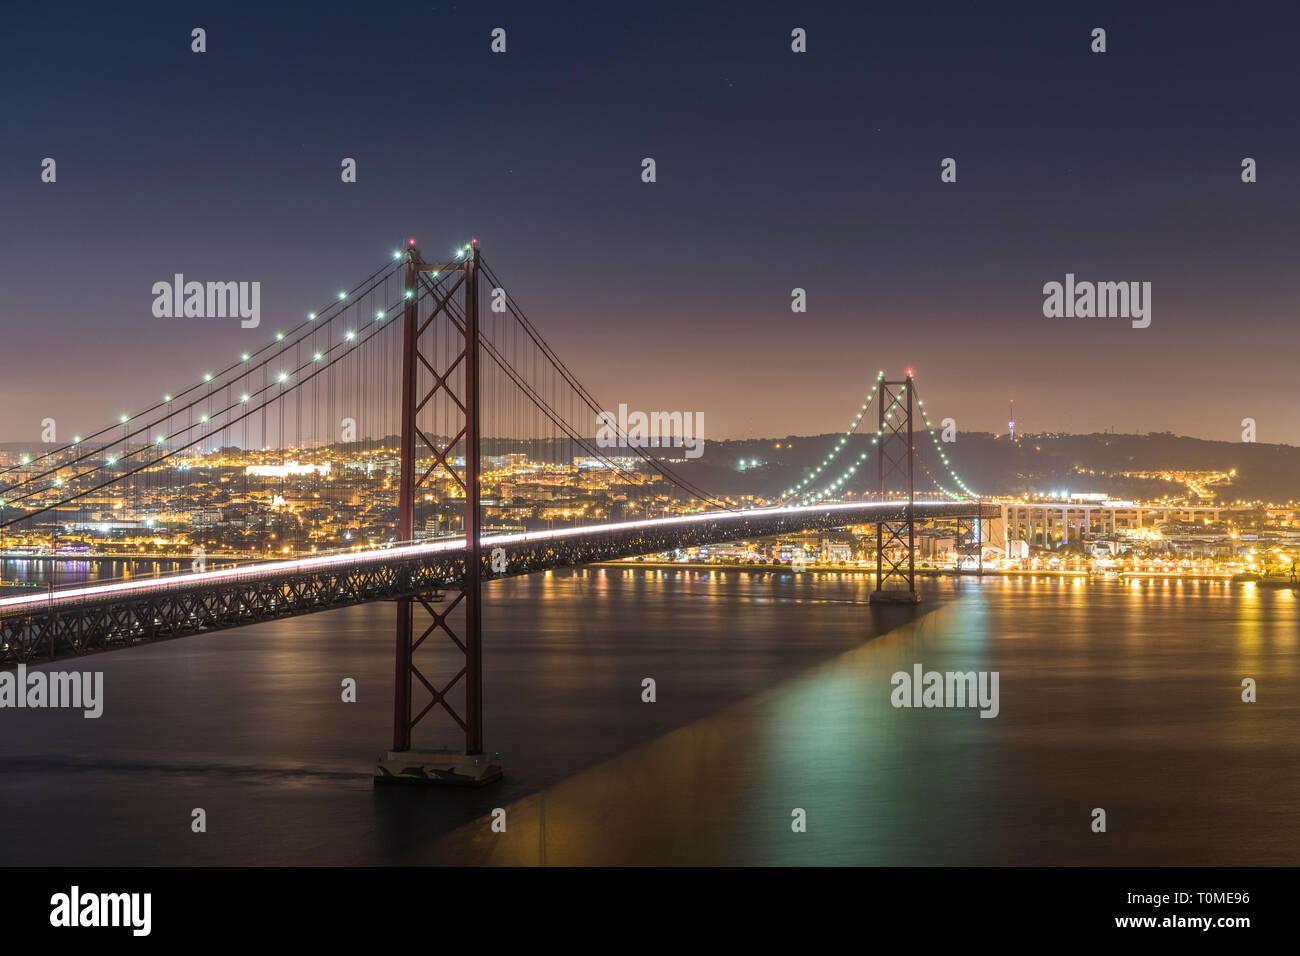 Night shot of Ponte 25 de Abril (bridge) and Lisbon, Portugal Stock Photo